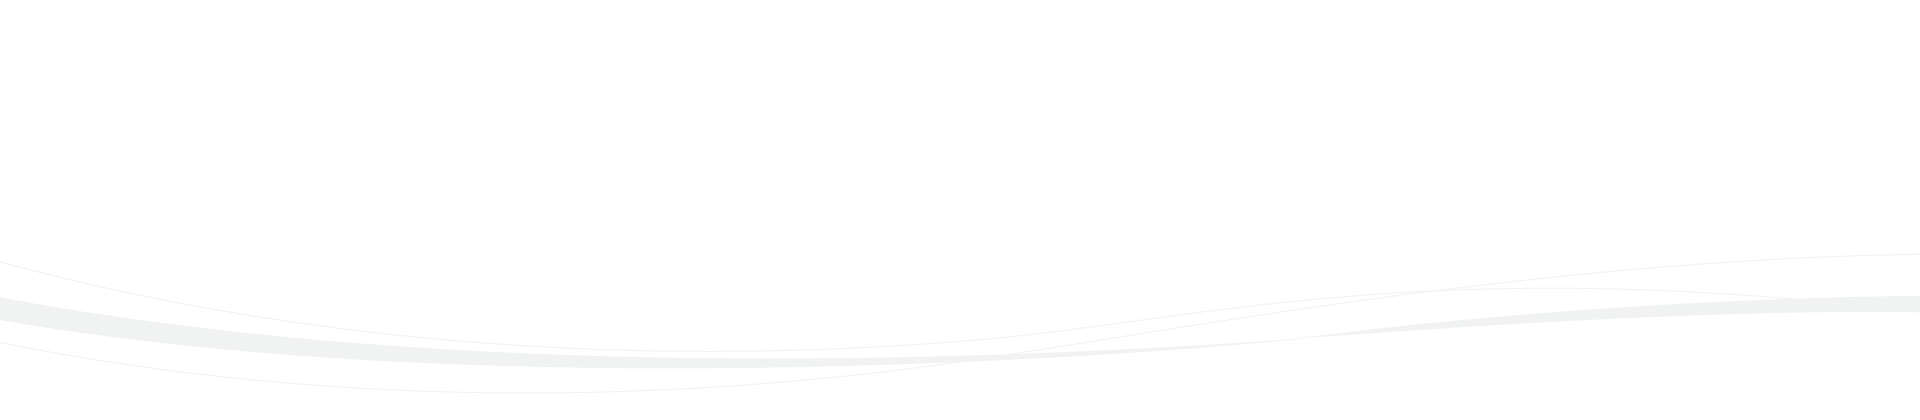 lines_bkg